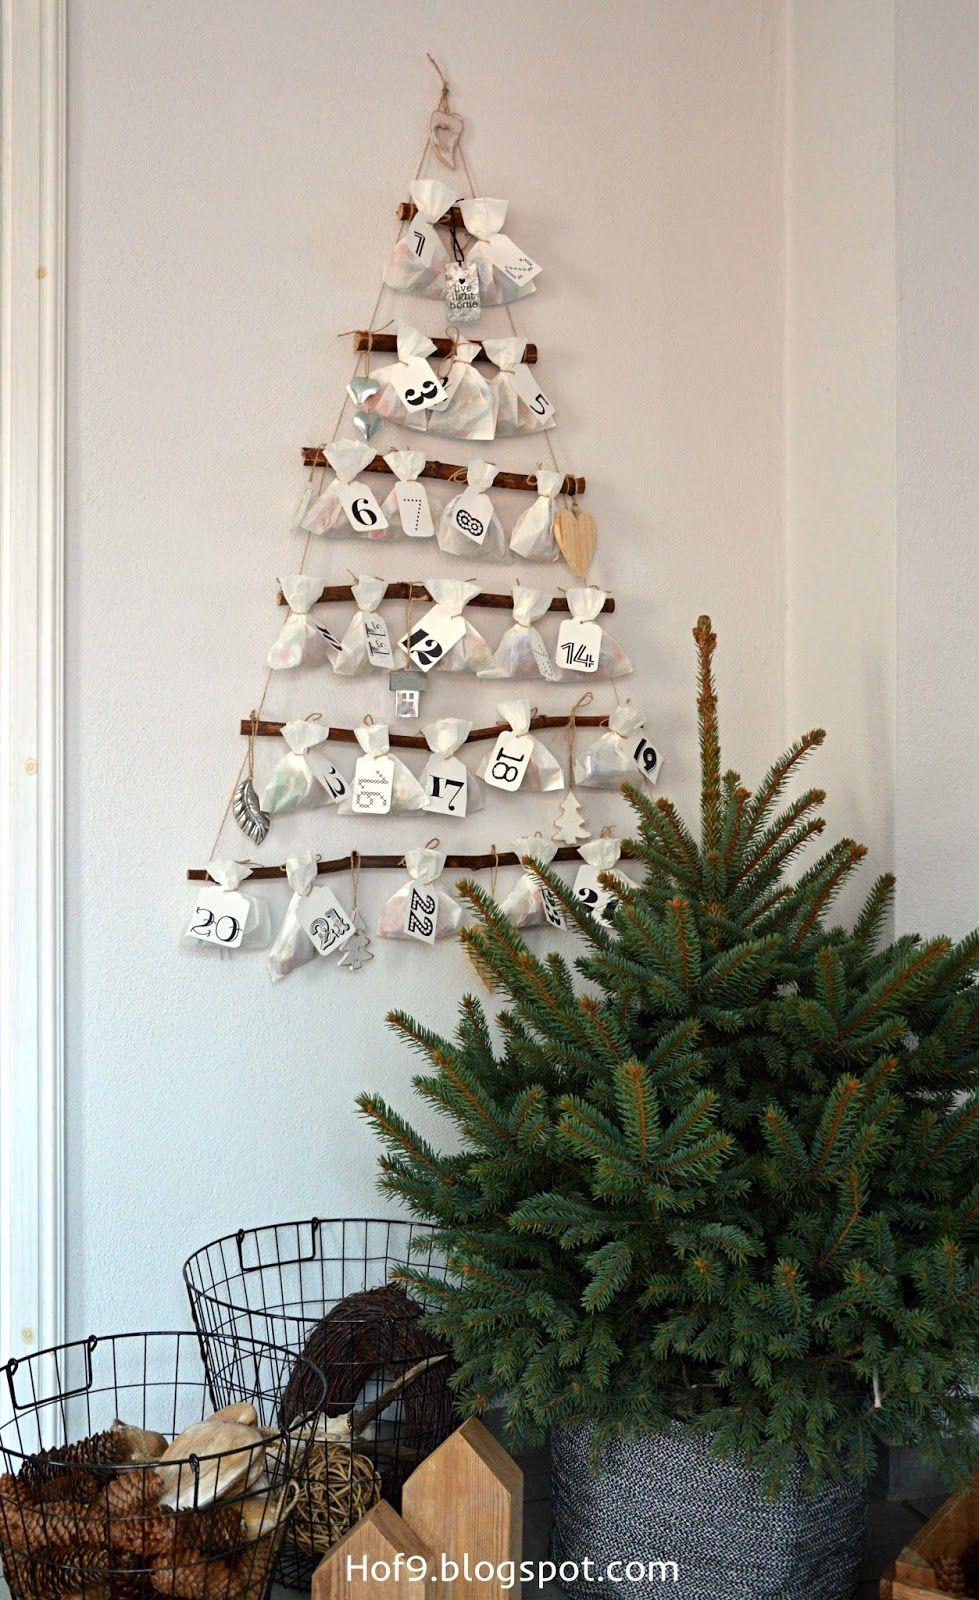 Diy Adventskalender Weihnachtsdeko Adventskalender Basteln